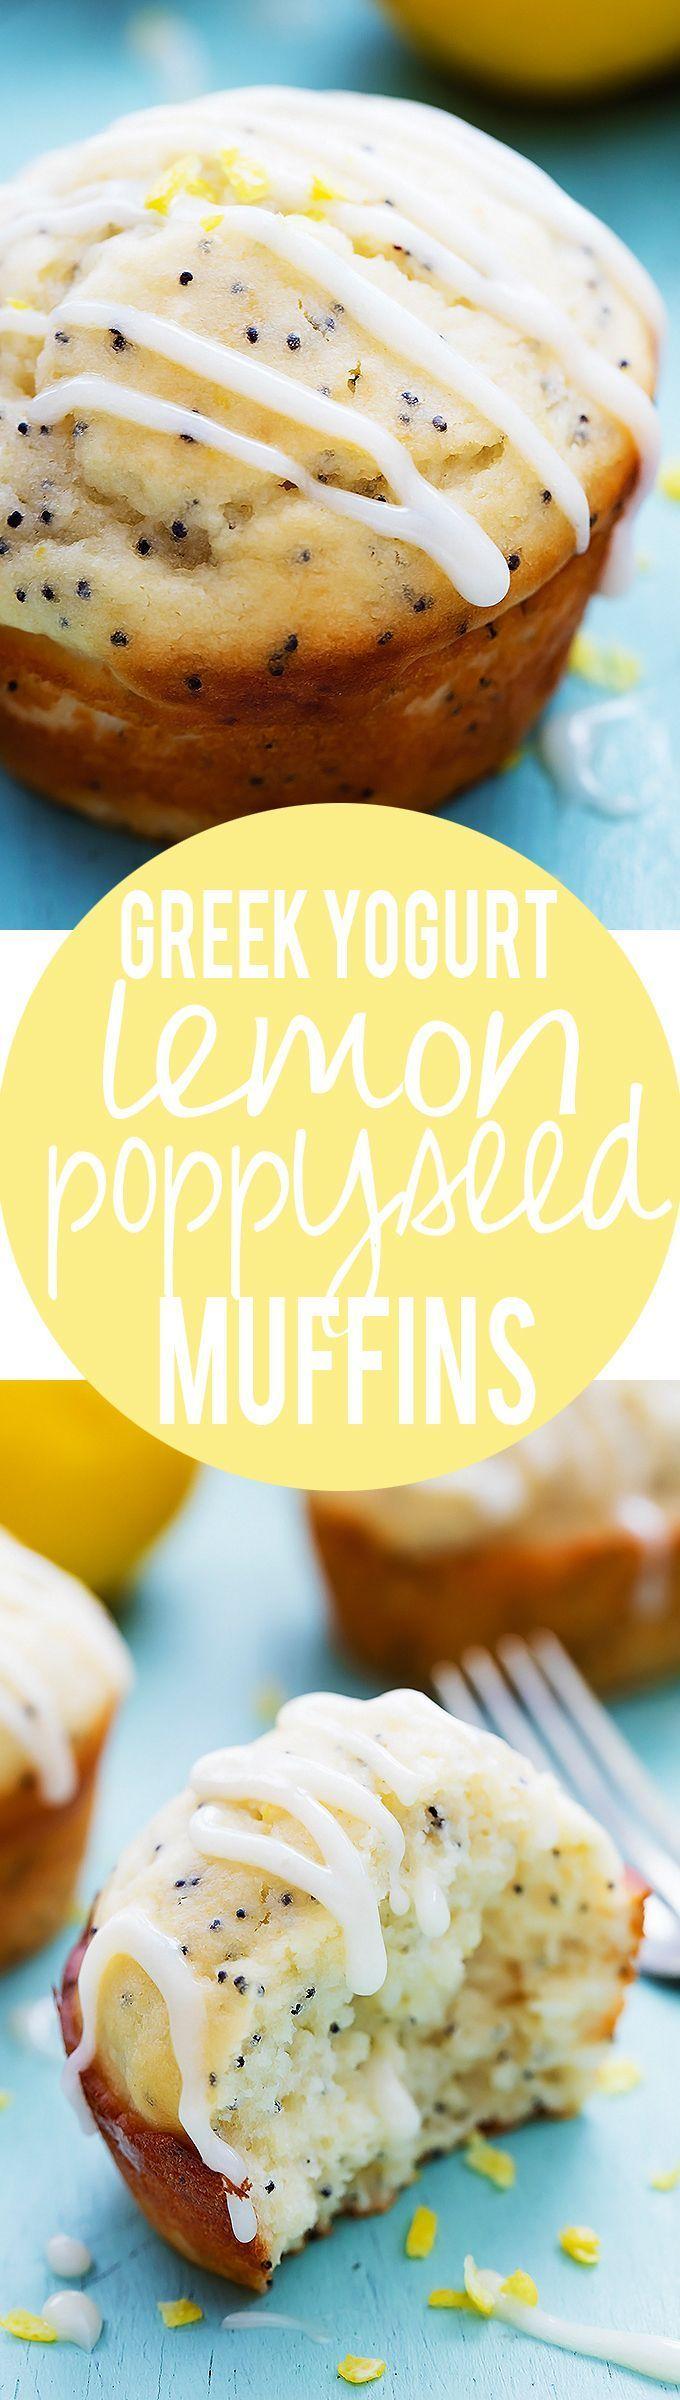 Greek Yogurt Lemon Poppyseed Muffins with Lemon Cream Cheese Glaze | Creme de la Crumb